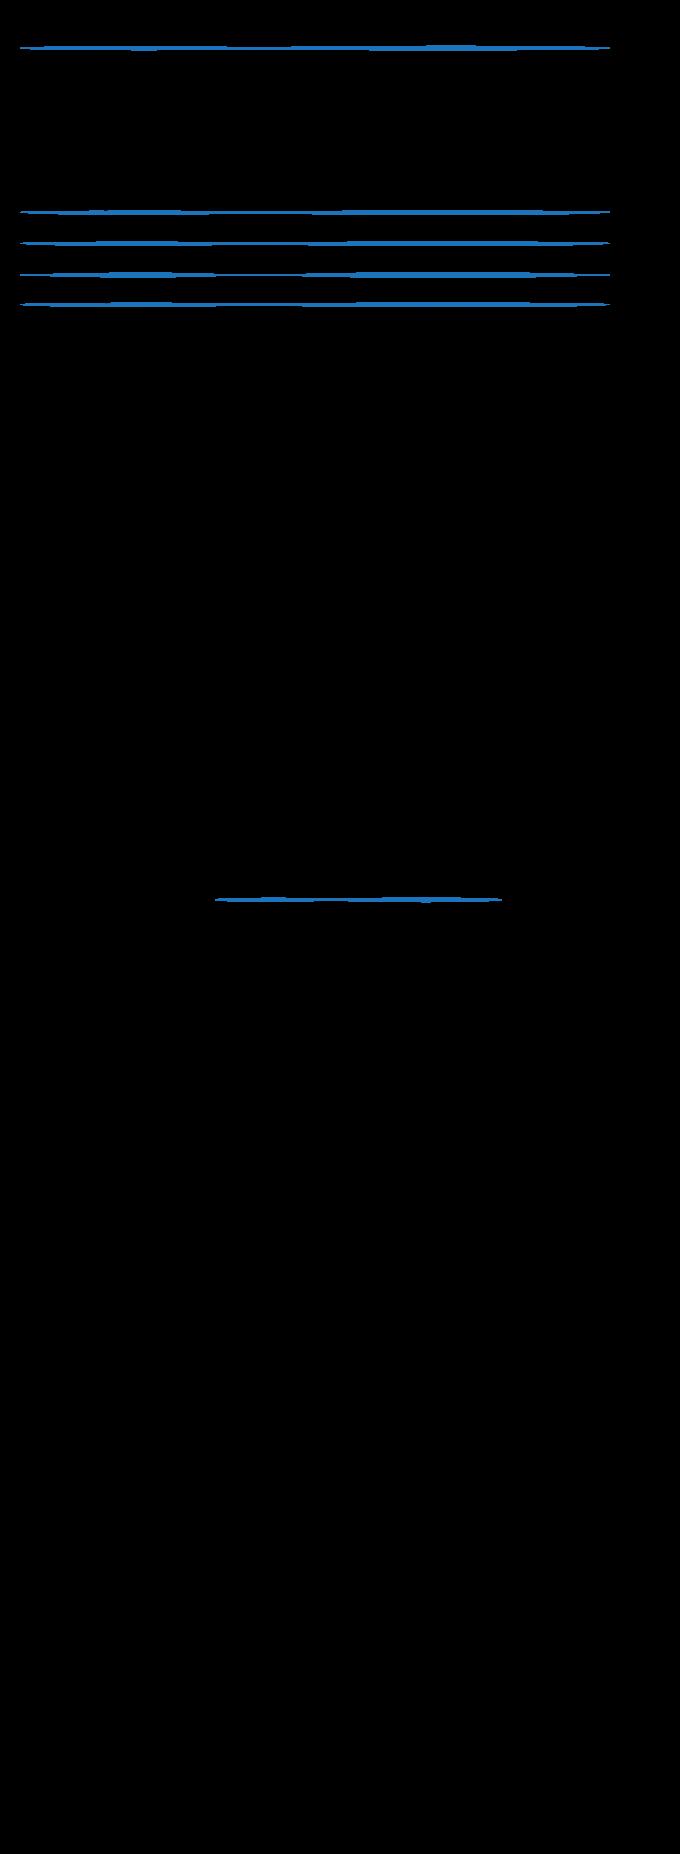 Text_Whg 2-01